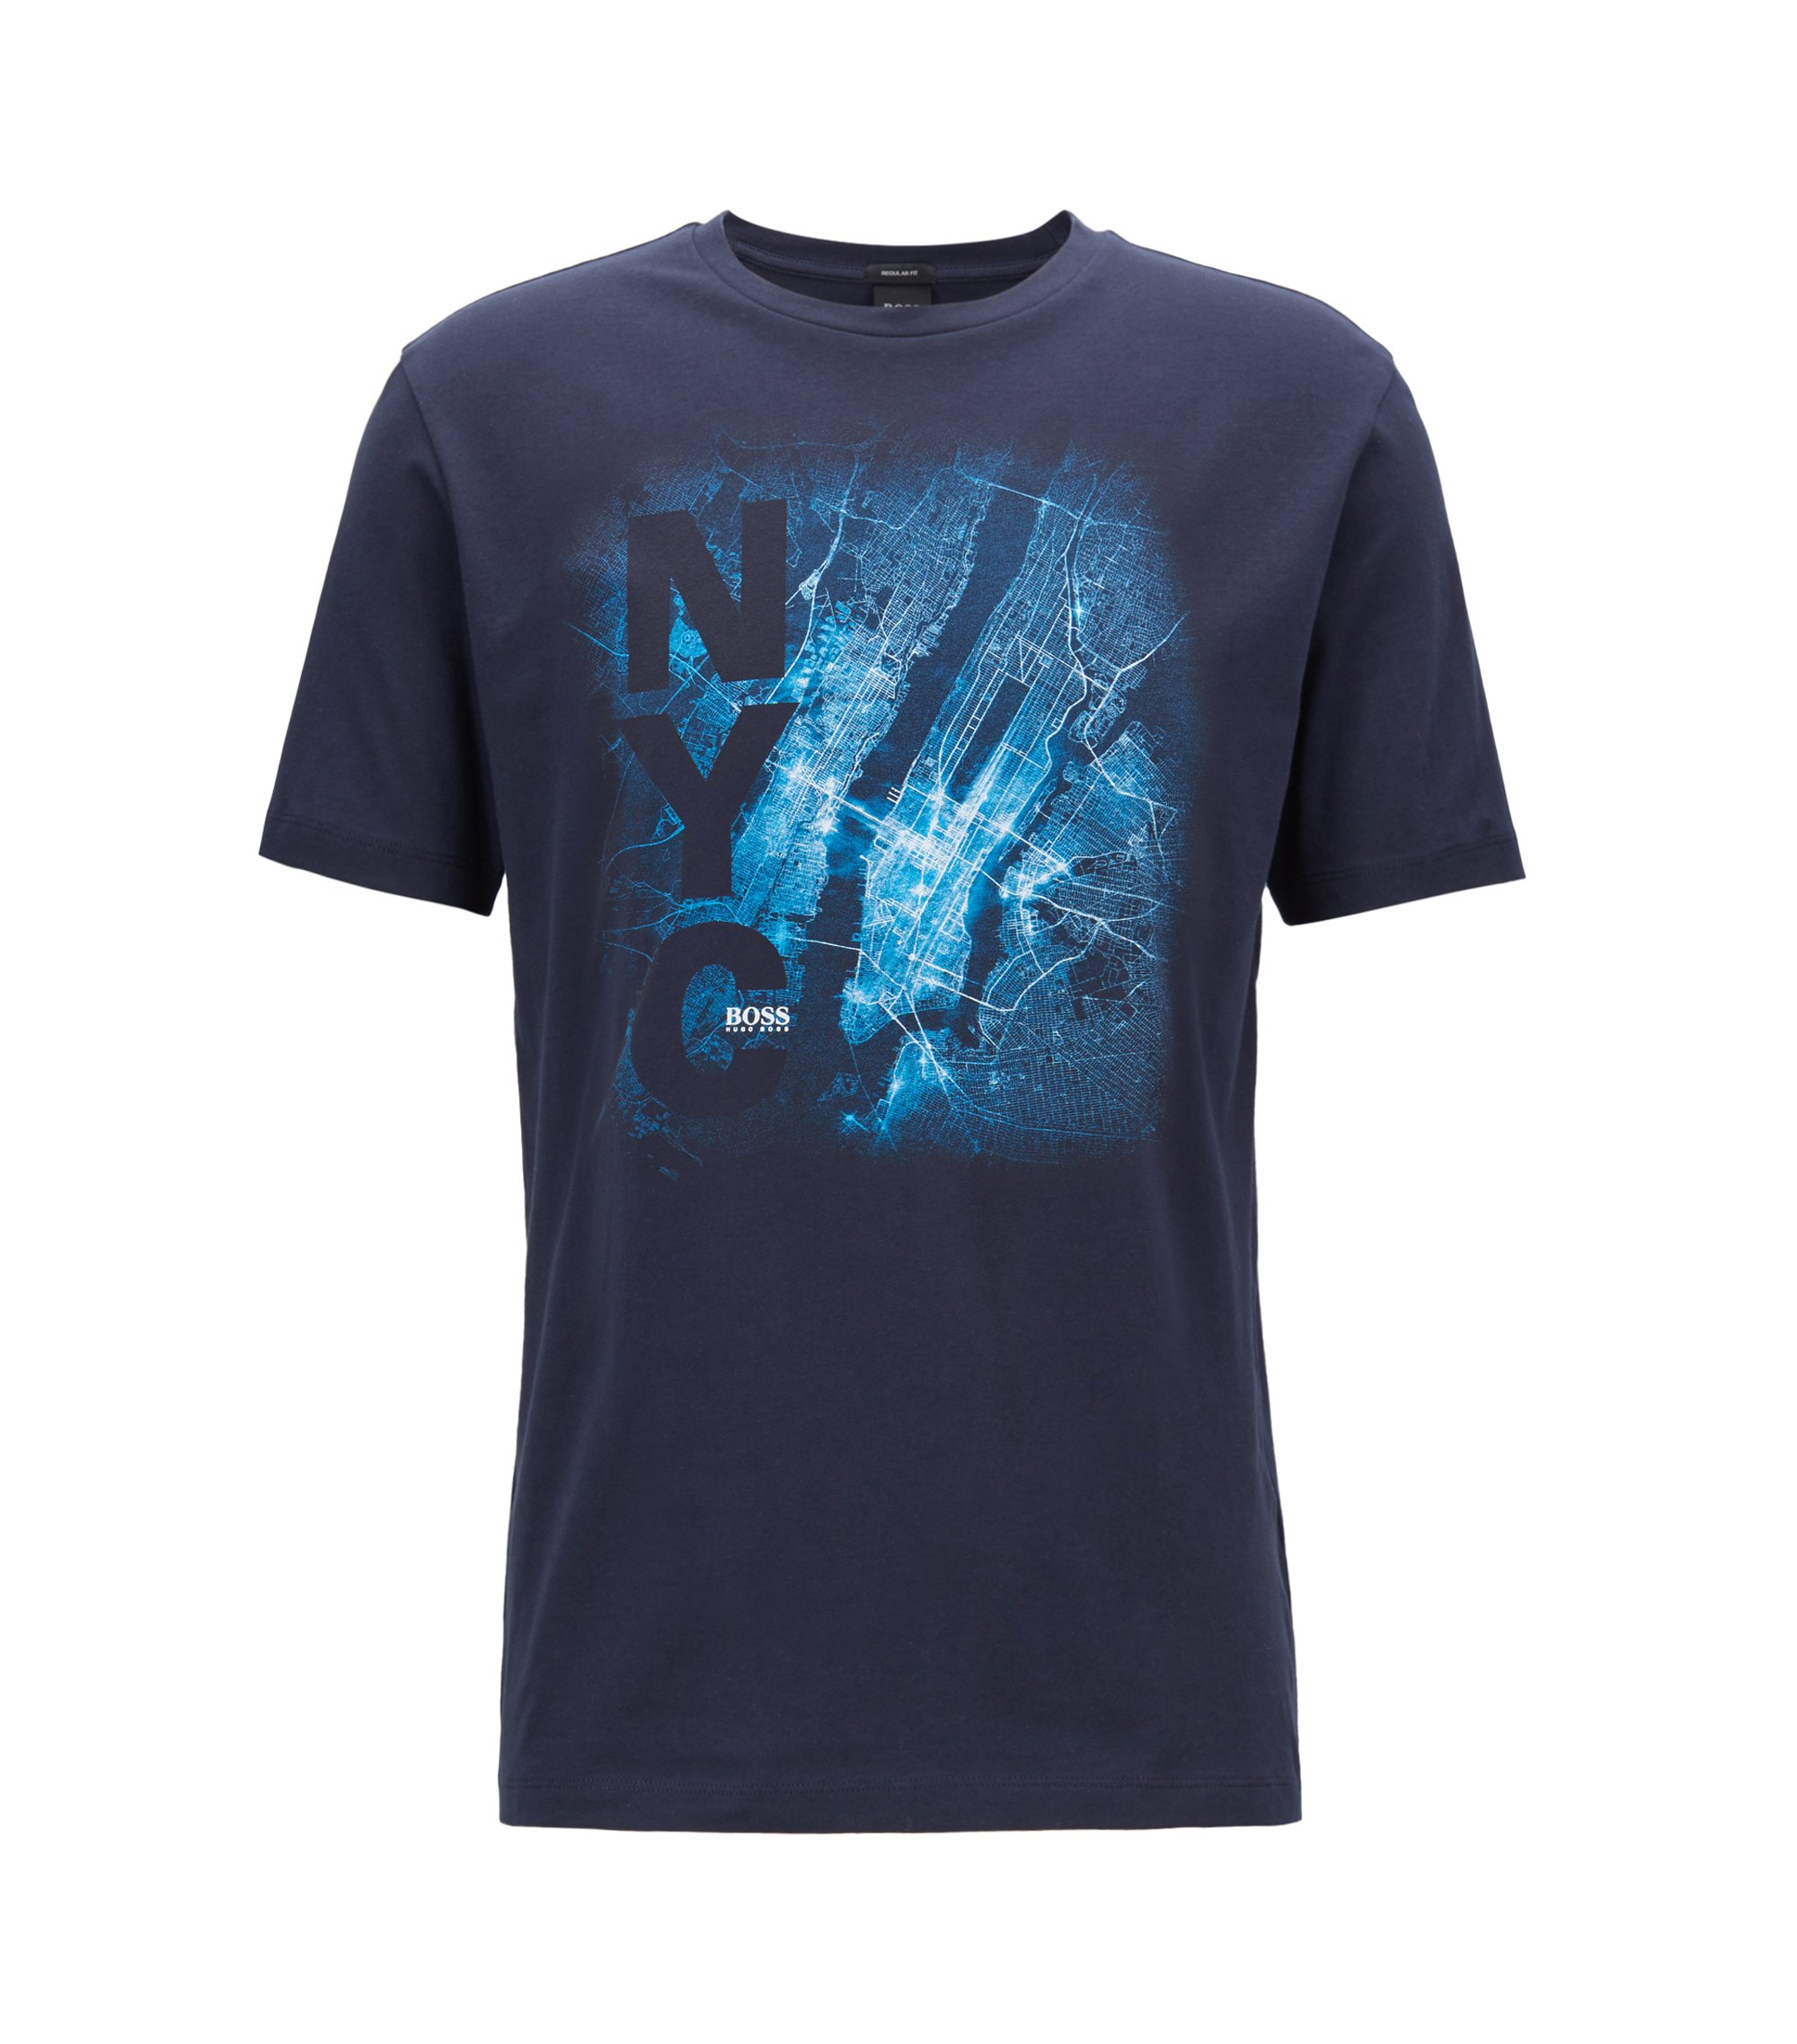 Limited Edition FormelE T-Shirt mit New York City Print, Dunkelblau